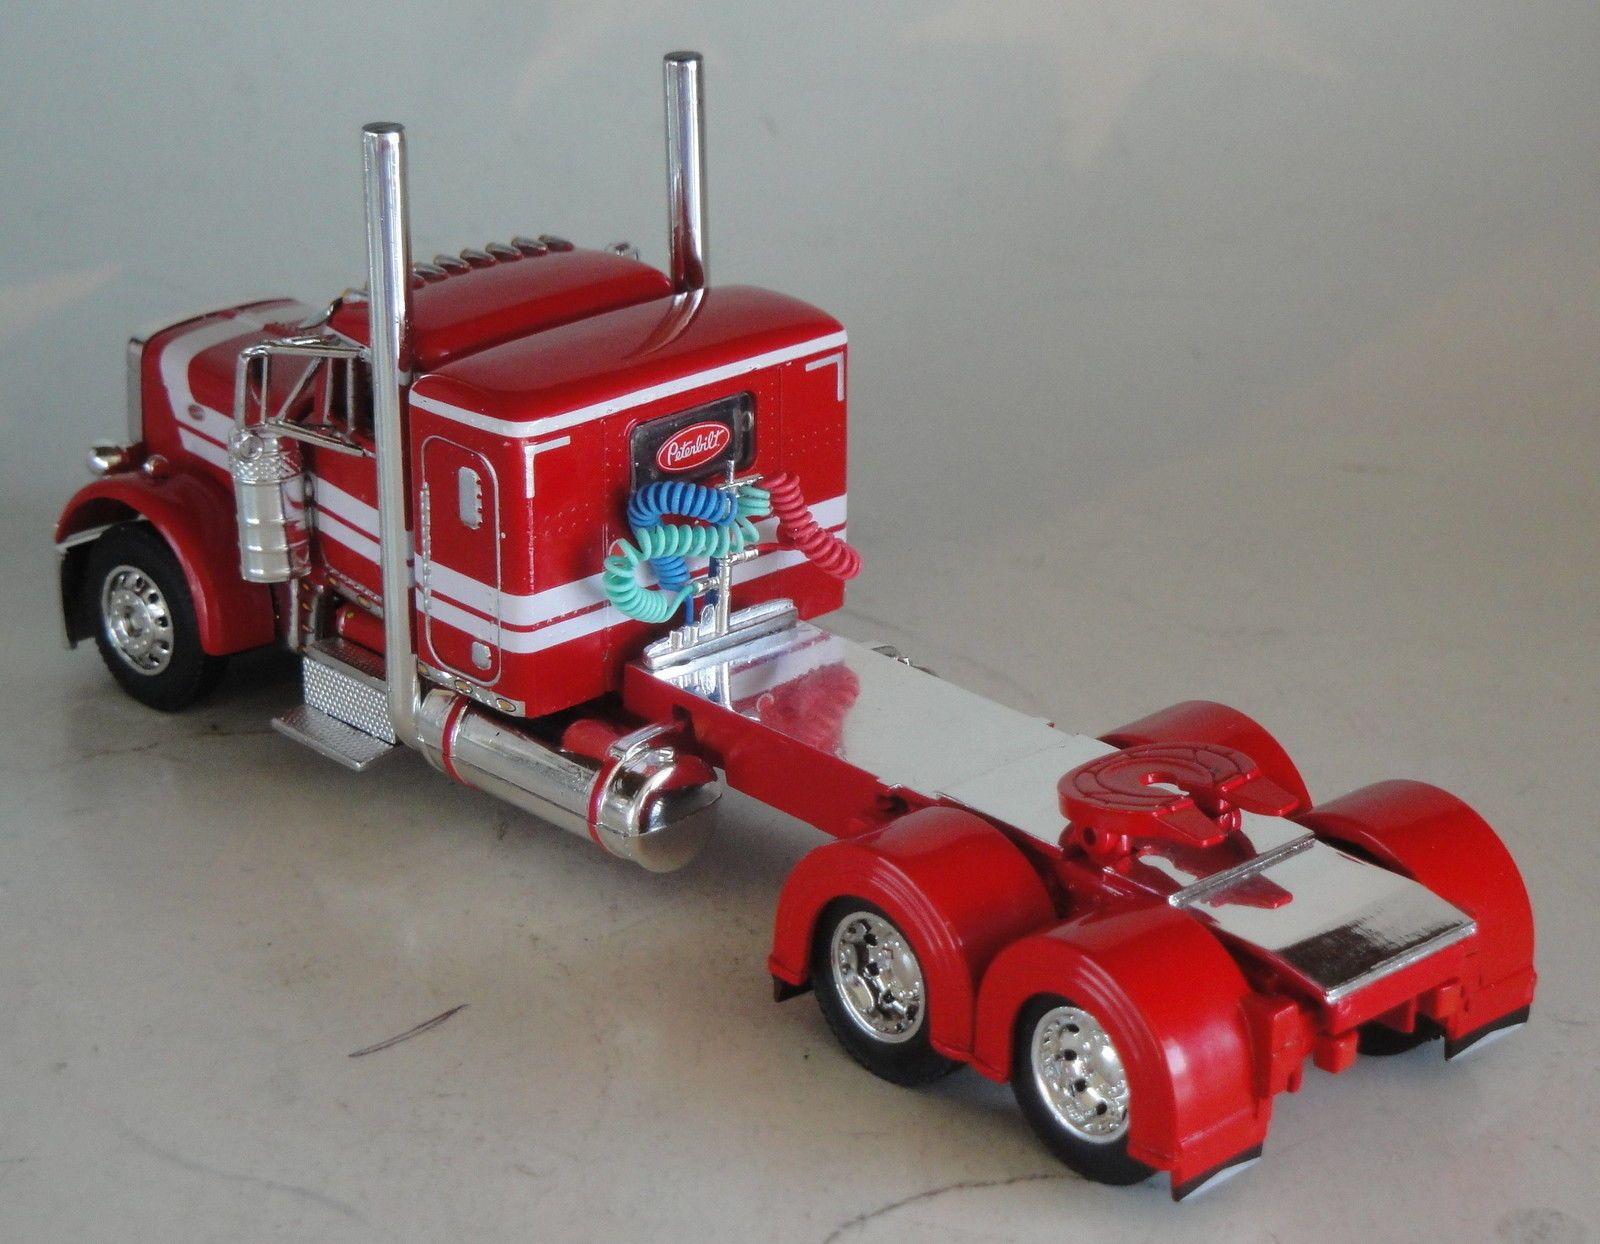 peterbilt 379 model Tractor Trailer by Jada Toys RoadRigz ...  Peterbilt Model Car